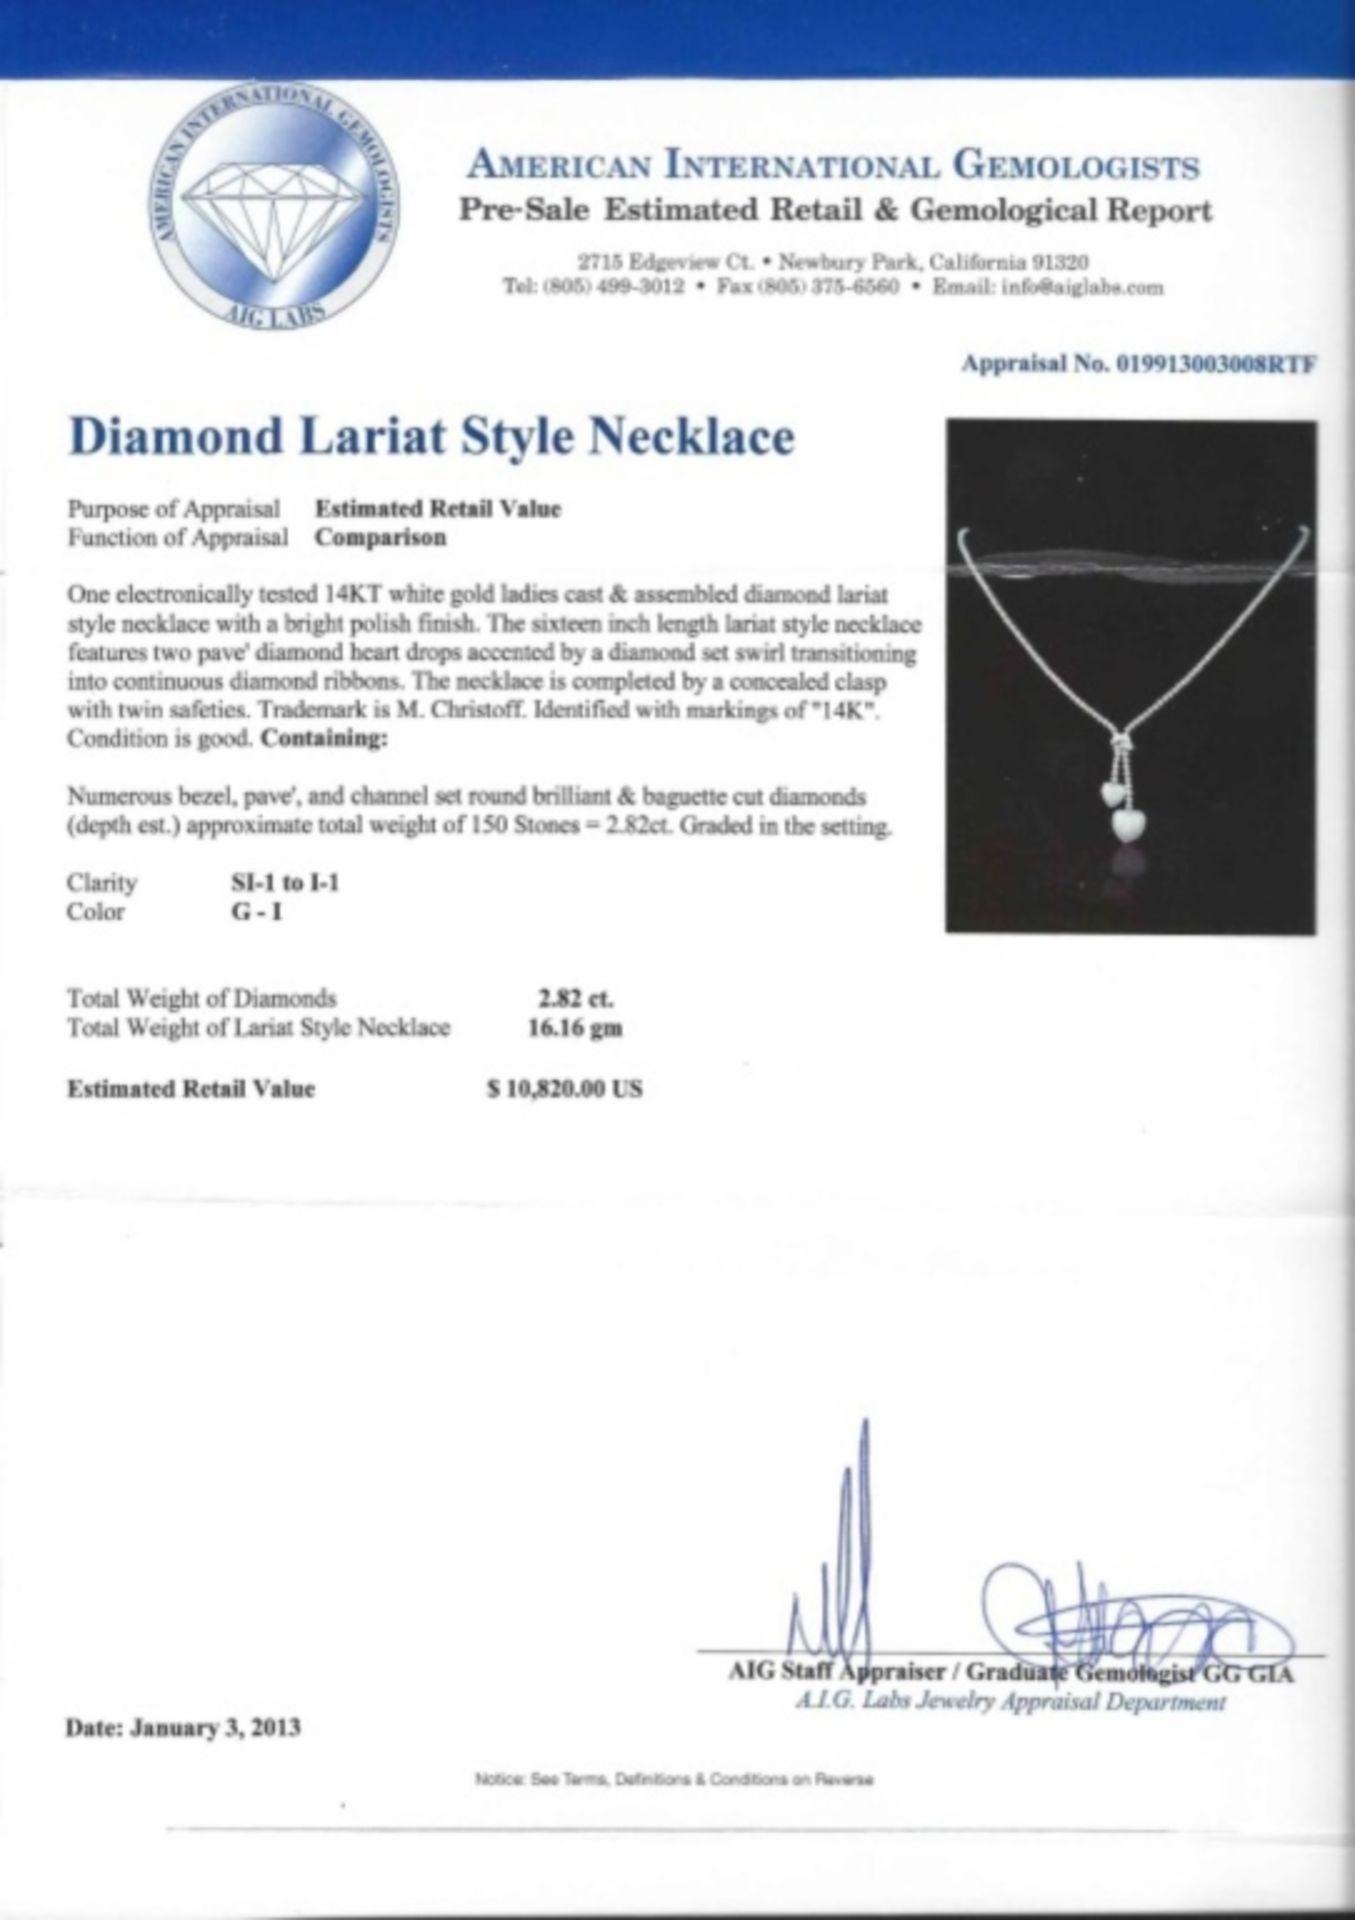 14K White Gold 2.82ct Lariat Style Diamond Neckla - Image 3 of 3